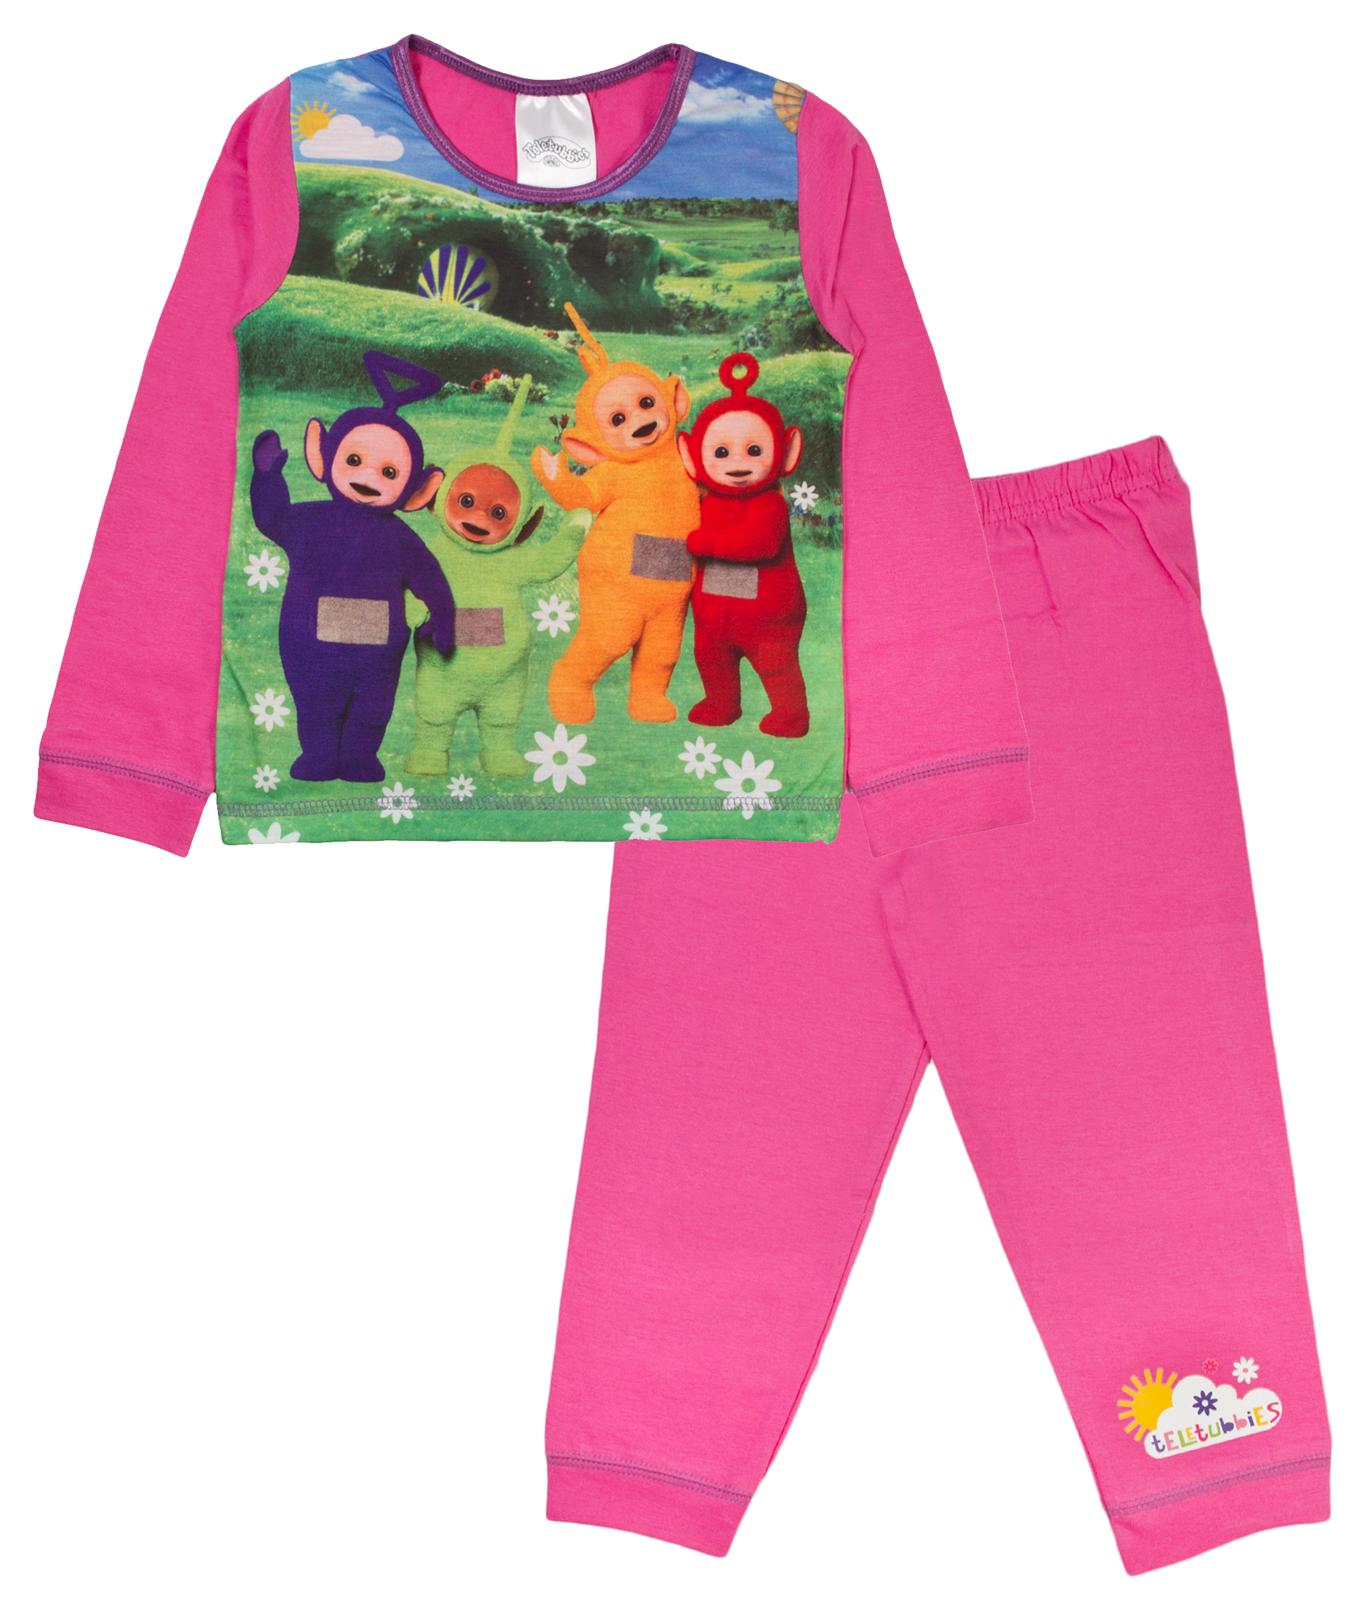 Boys-Girls-Teletubbies-Pyjamas-Pjs-Full-Length-PJ- - PNG Pyjamas